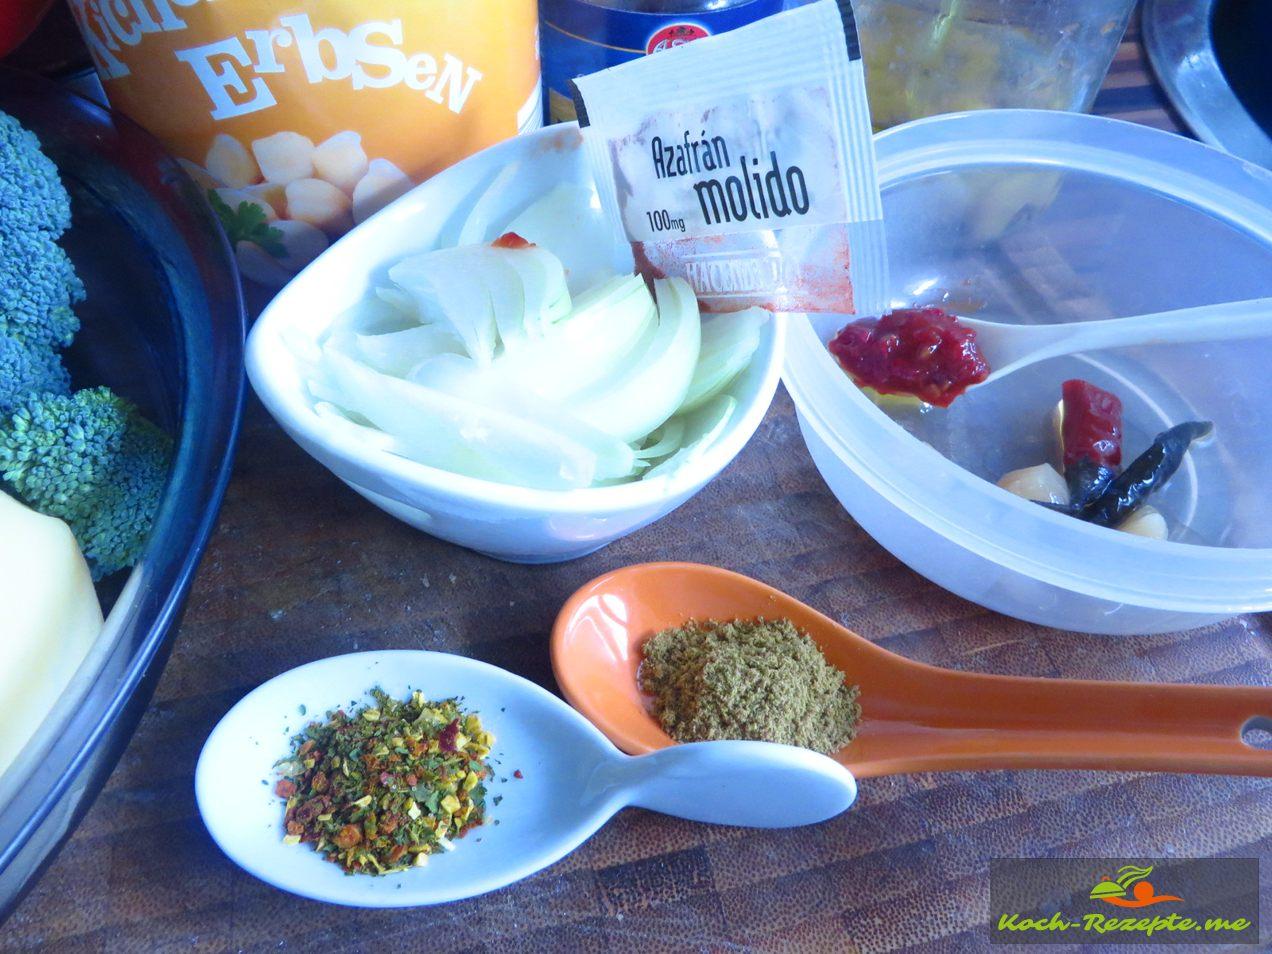 Dann Gewürze und Kräuter: Safran, Salz, Chilipulver, Kreuzkümmel, Sambal Olek